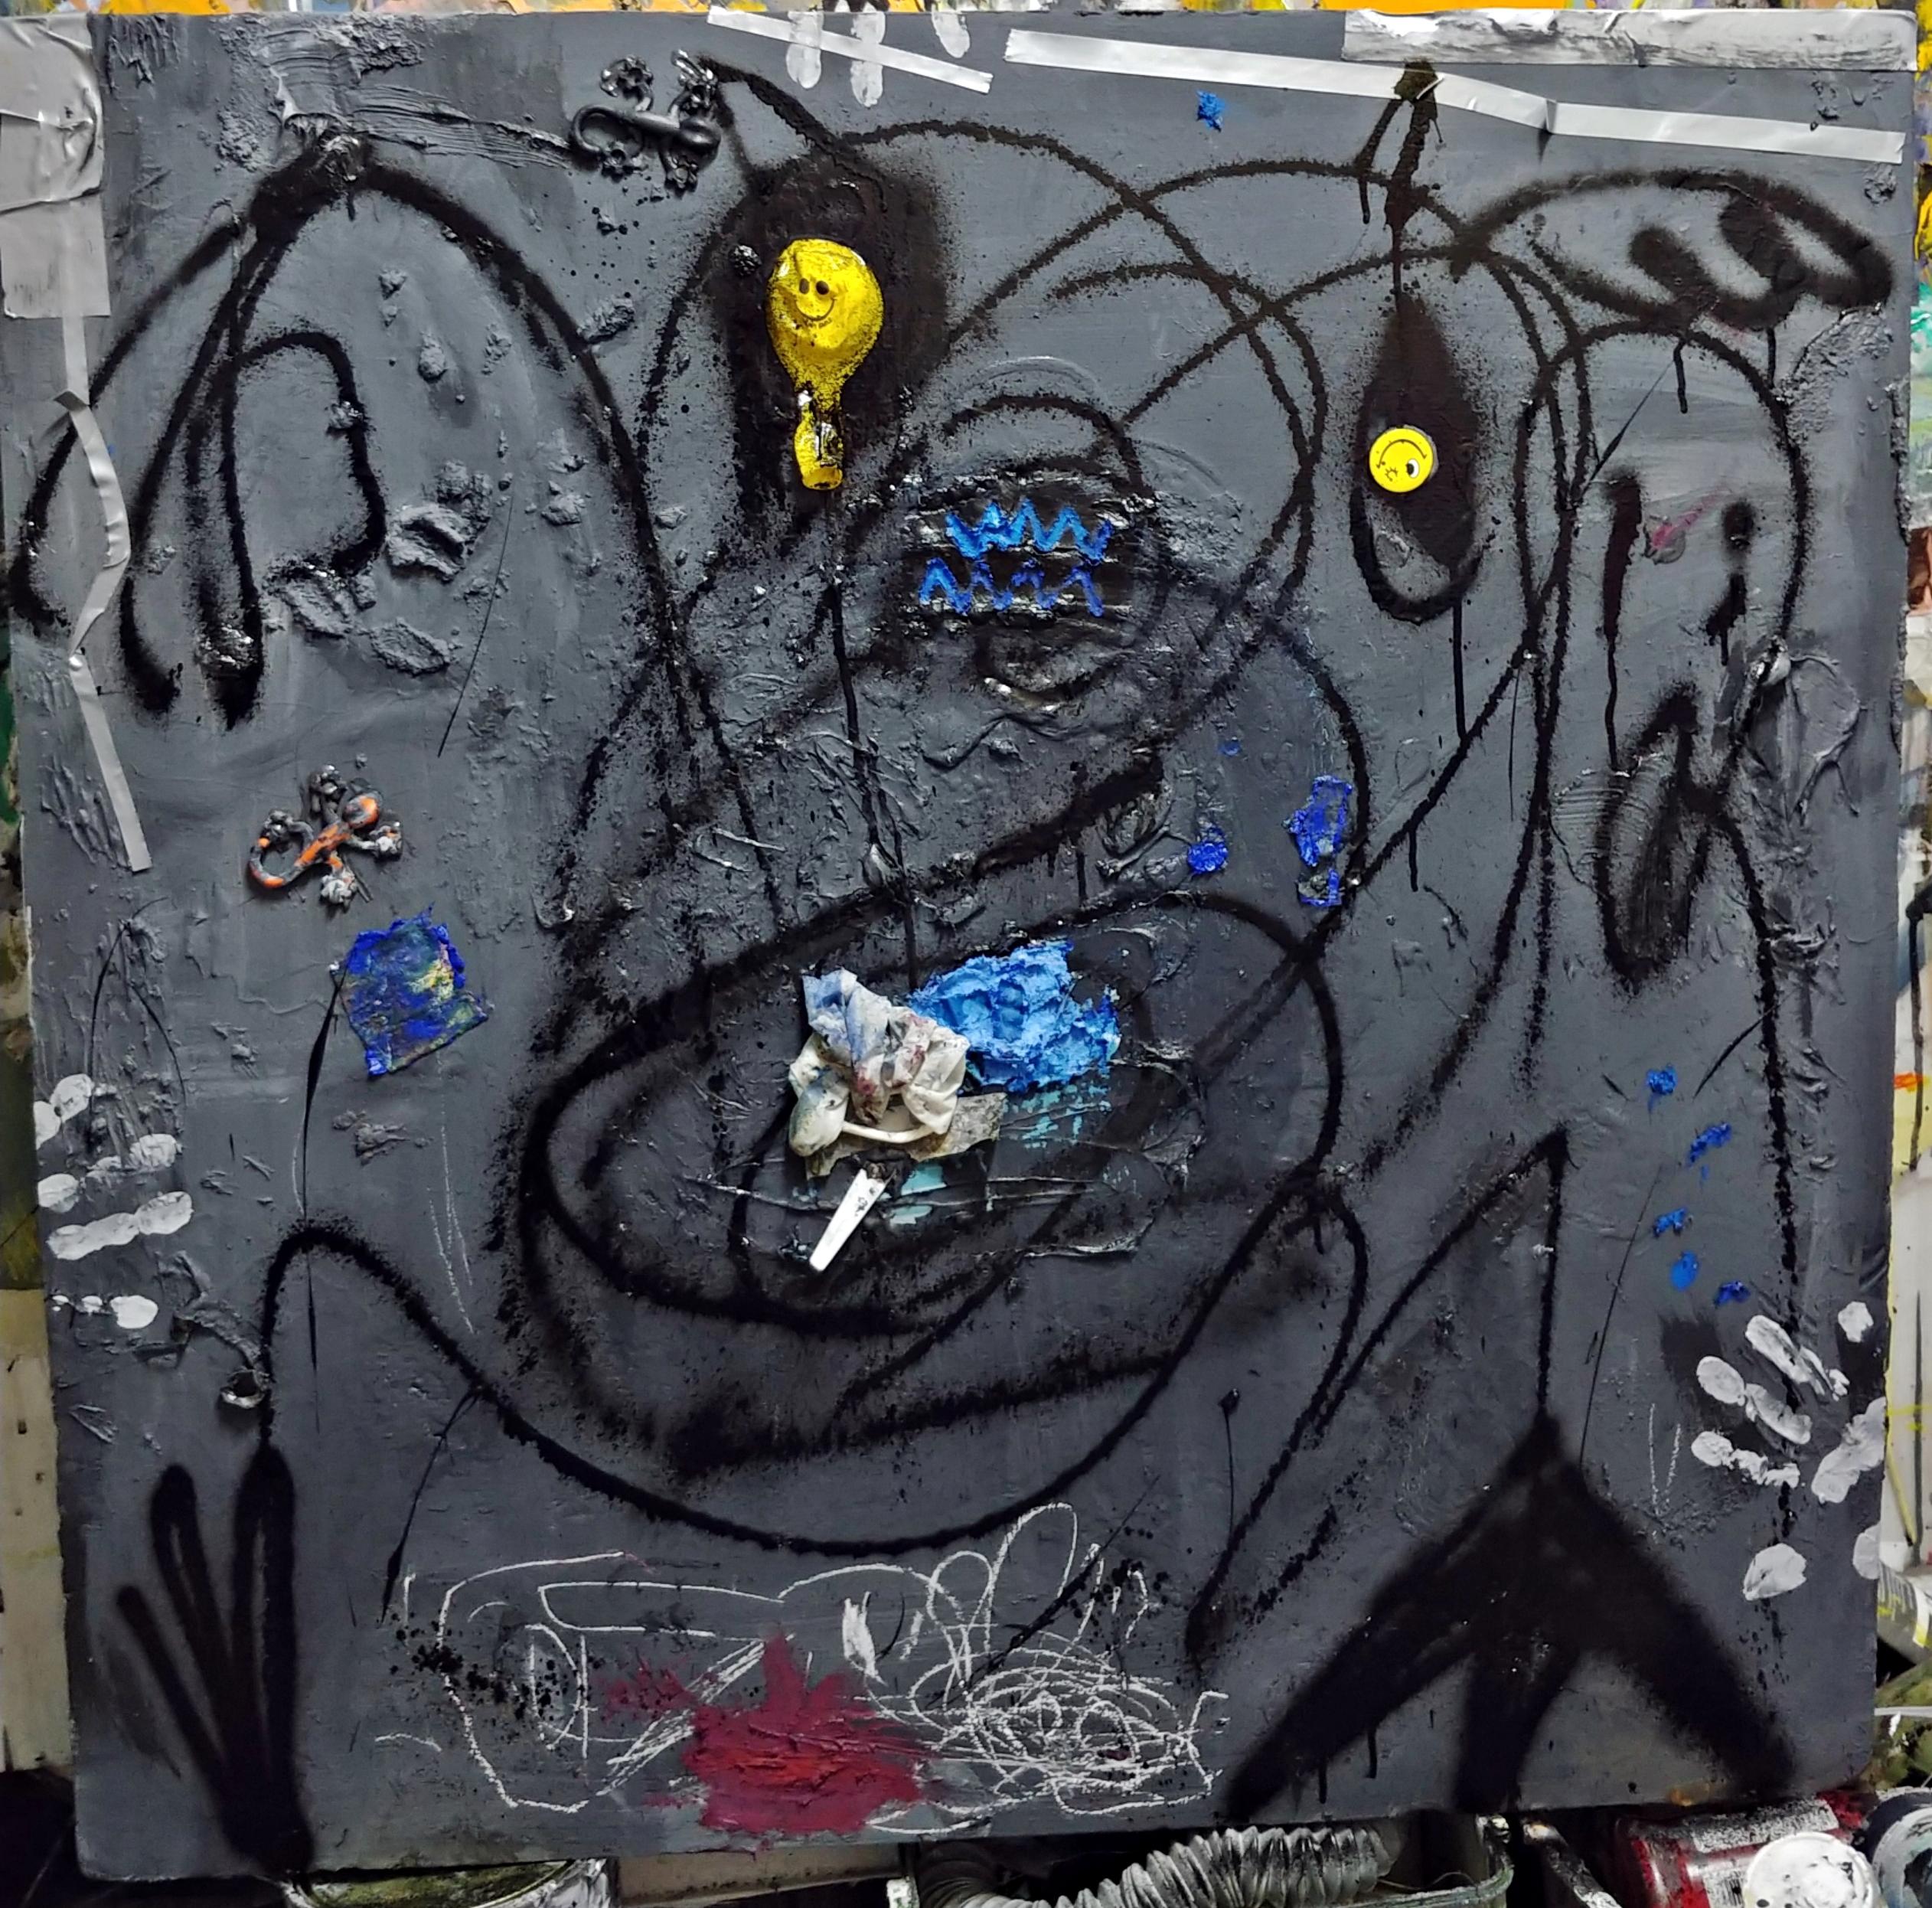 Ugly Duckling 29, 90cm x 90cm, 풍선, 유화, 락카, 분필, 면테이프, 플라스틱 on 아이소핑크, 2017